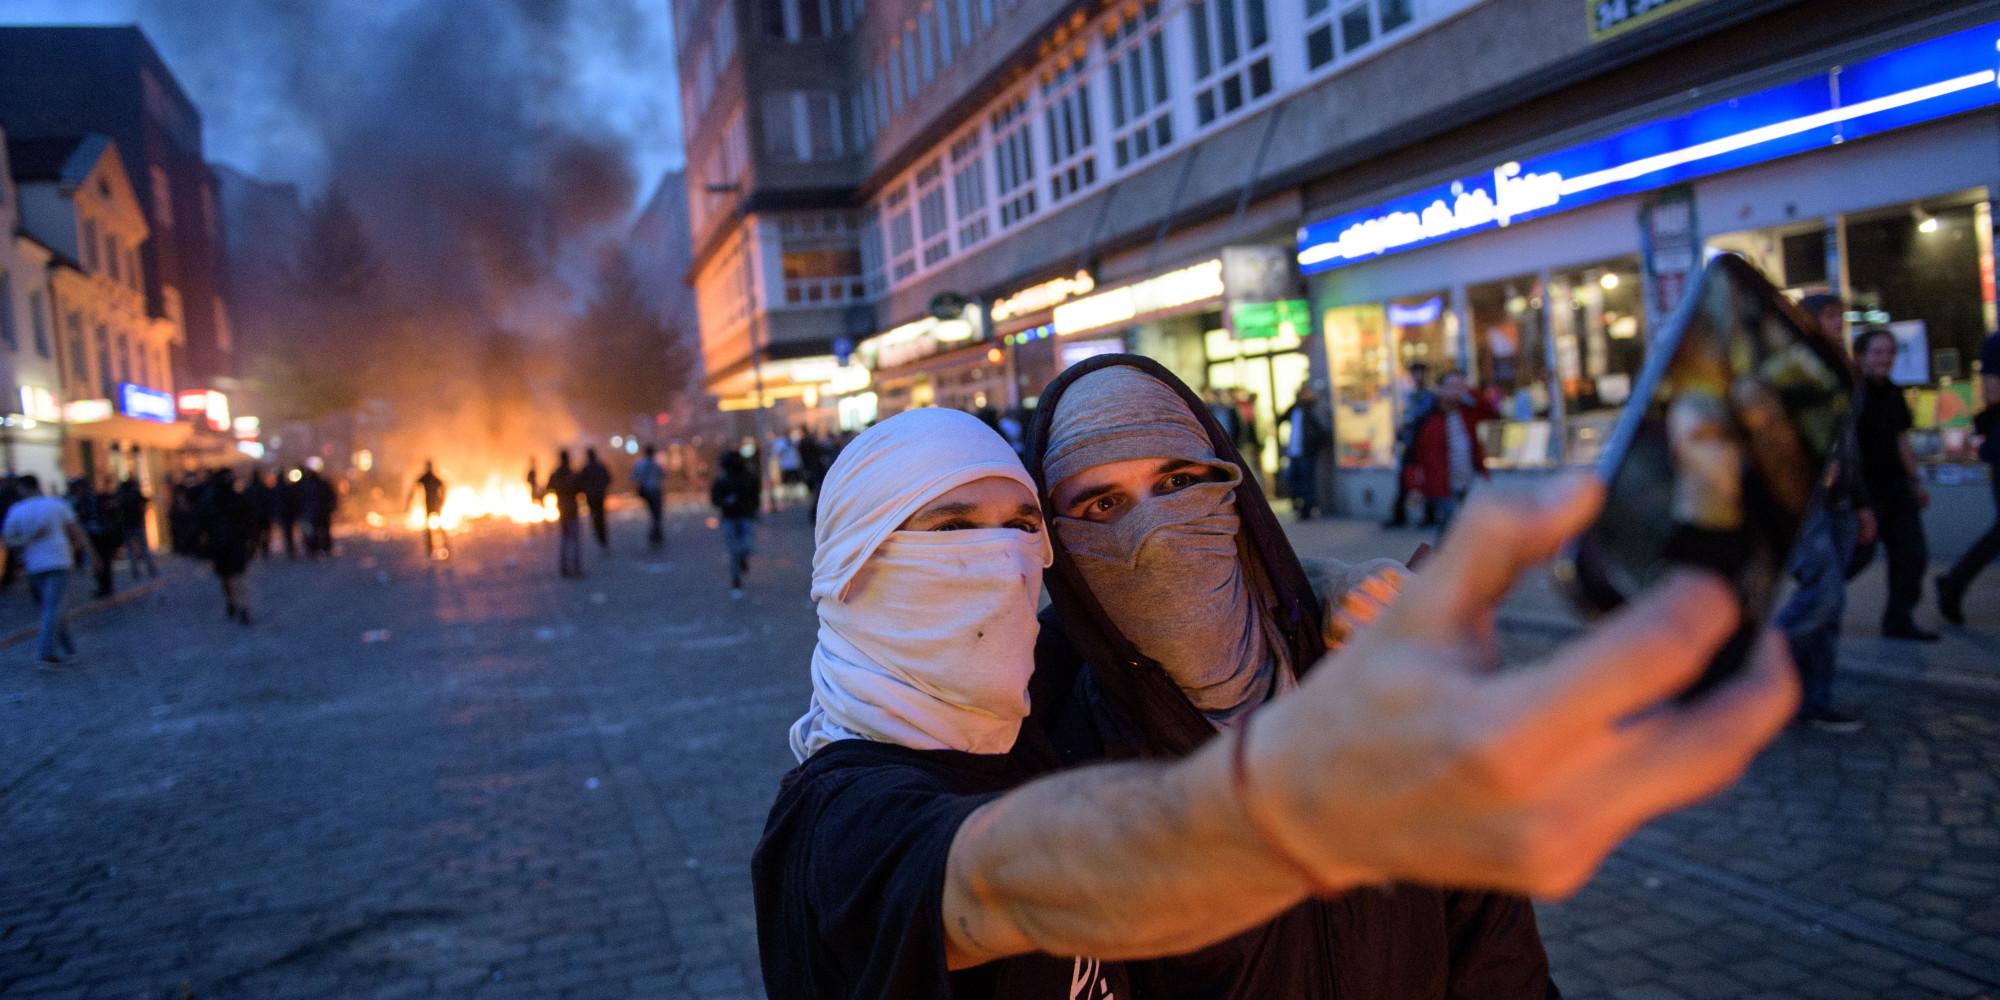 Krawall-Selfie mit iPhone: So geht G20-Kritik NICHT